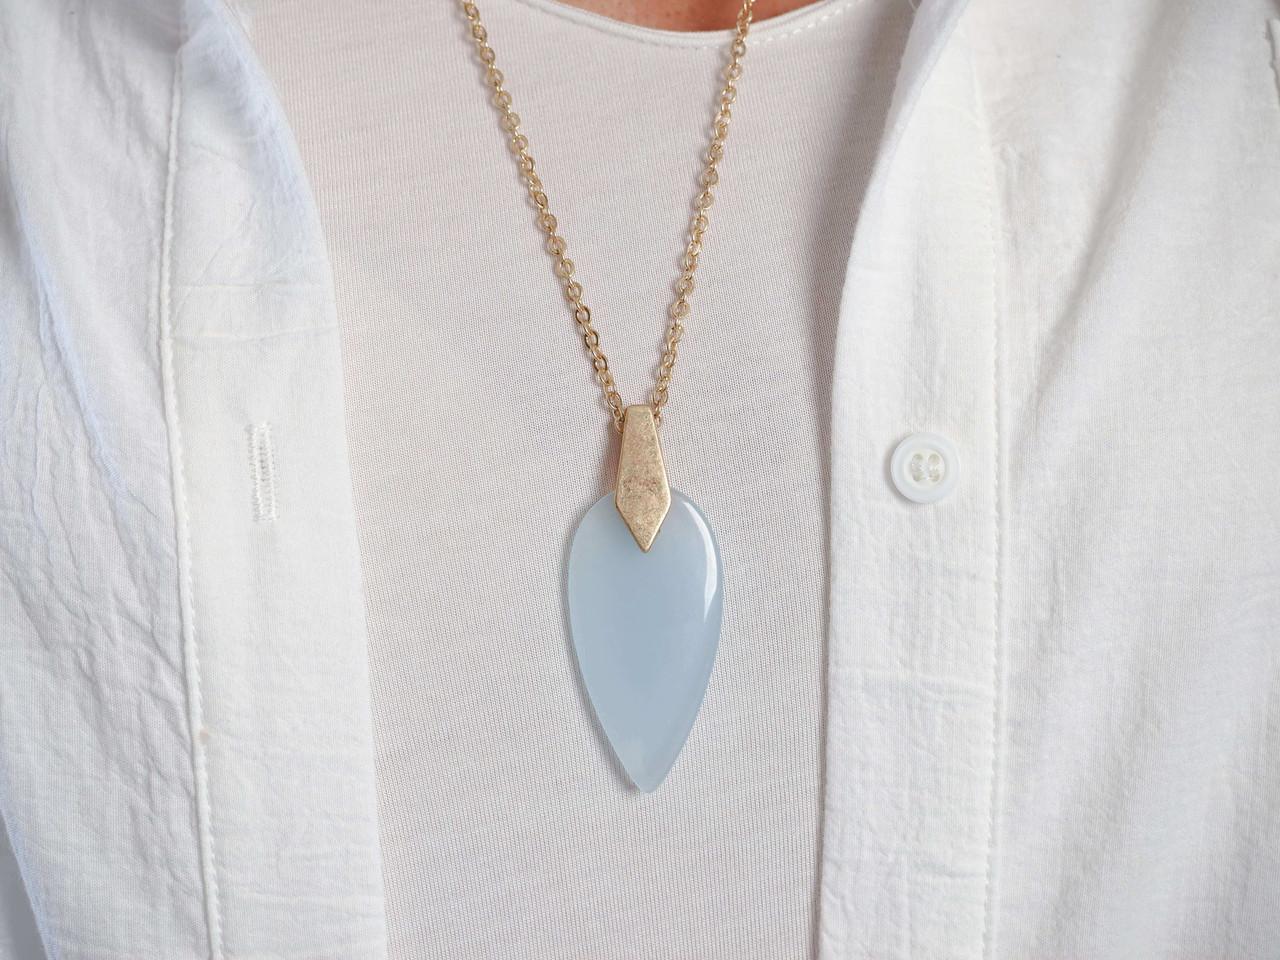 gold chain translucent blue pendant